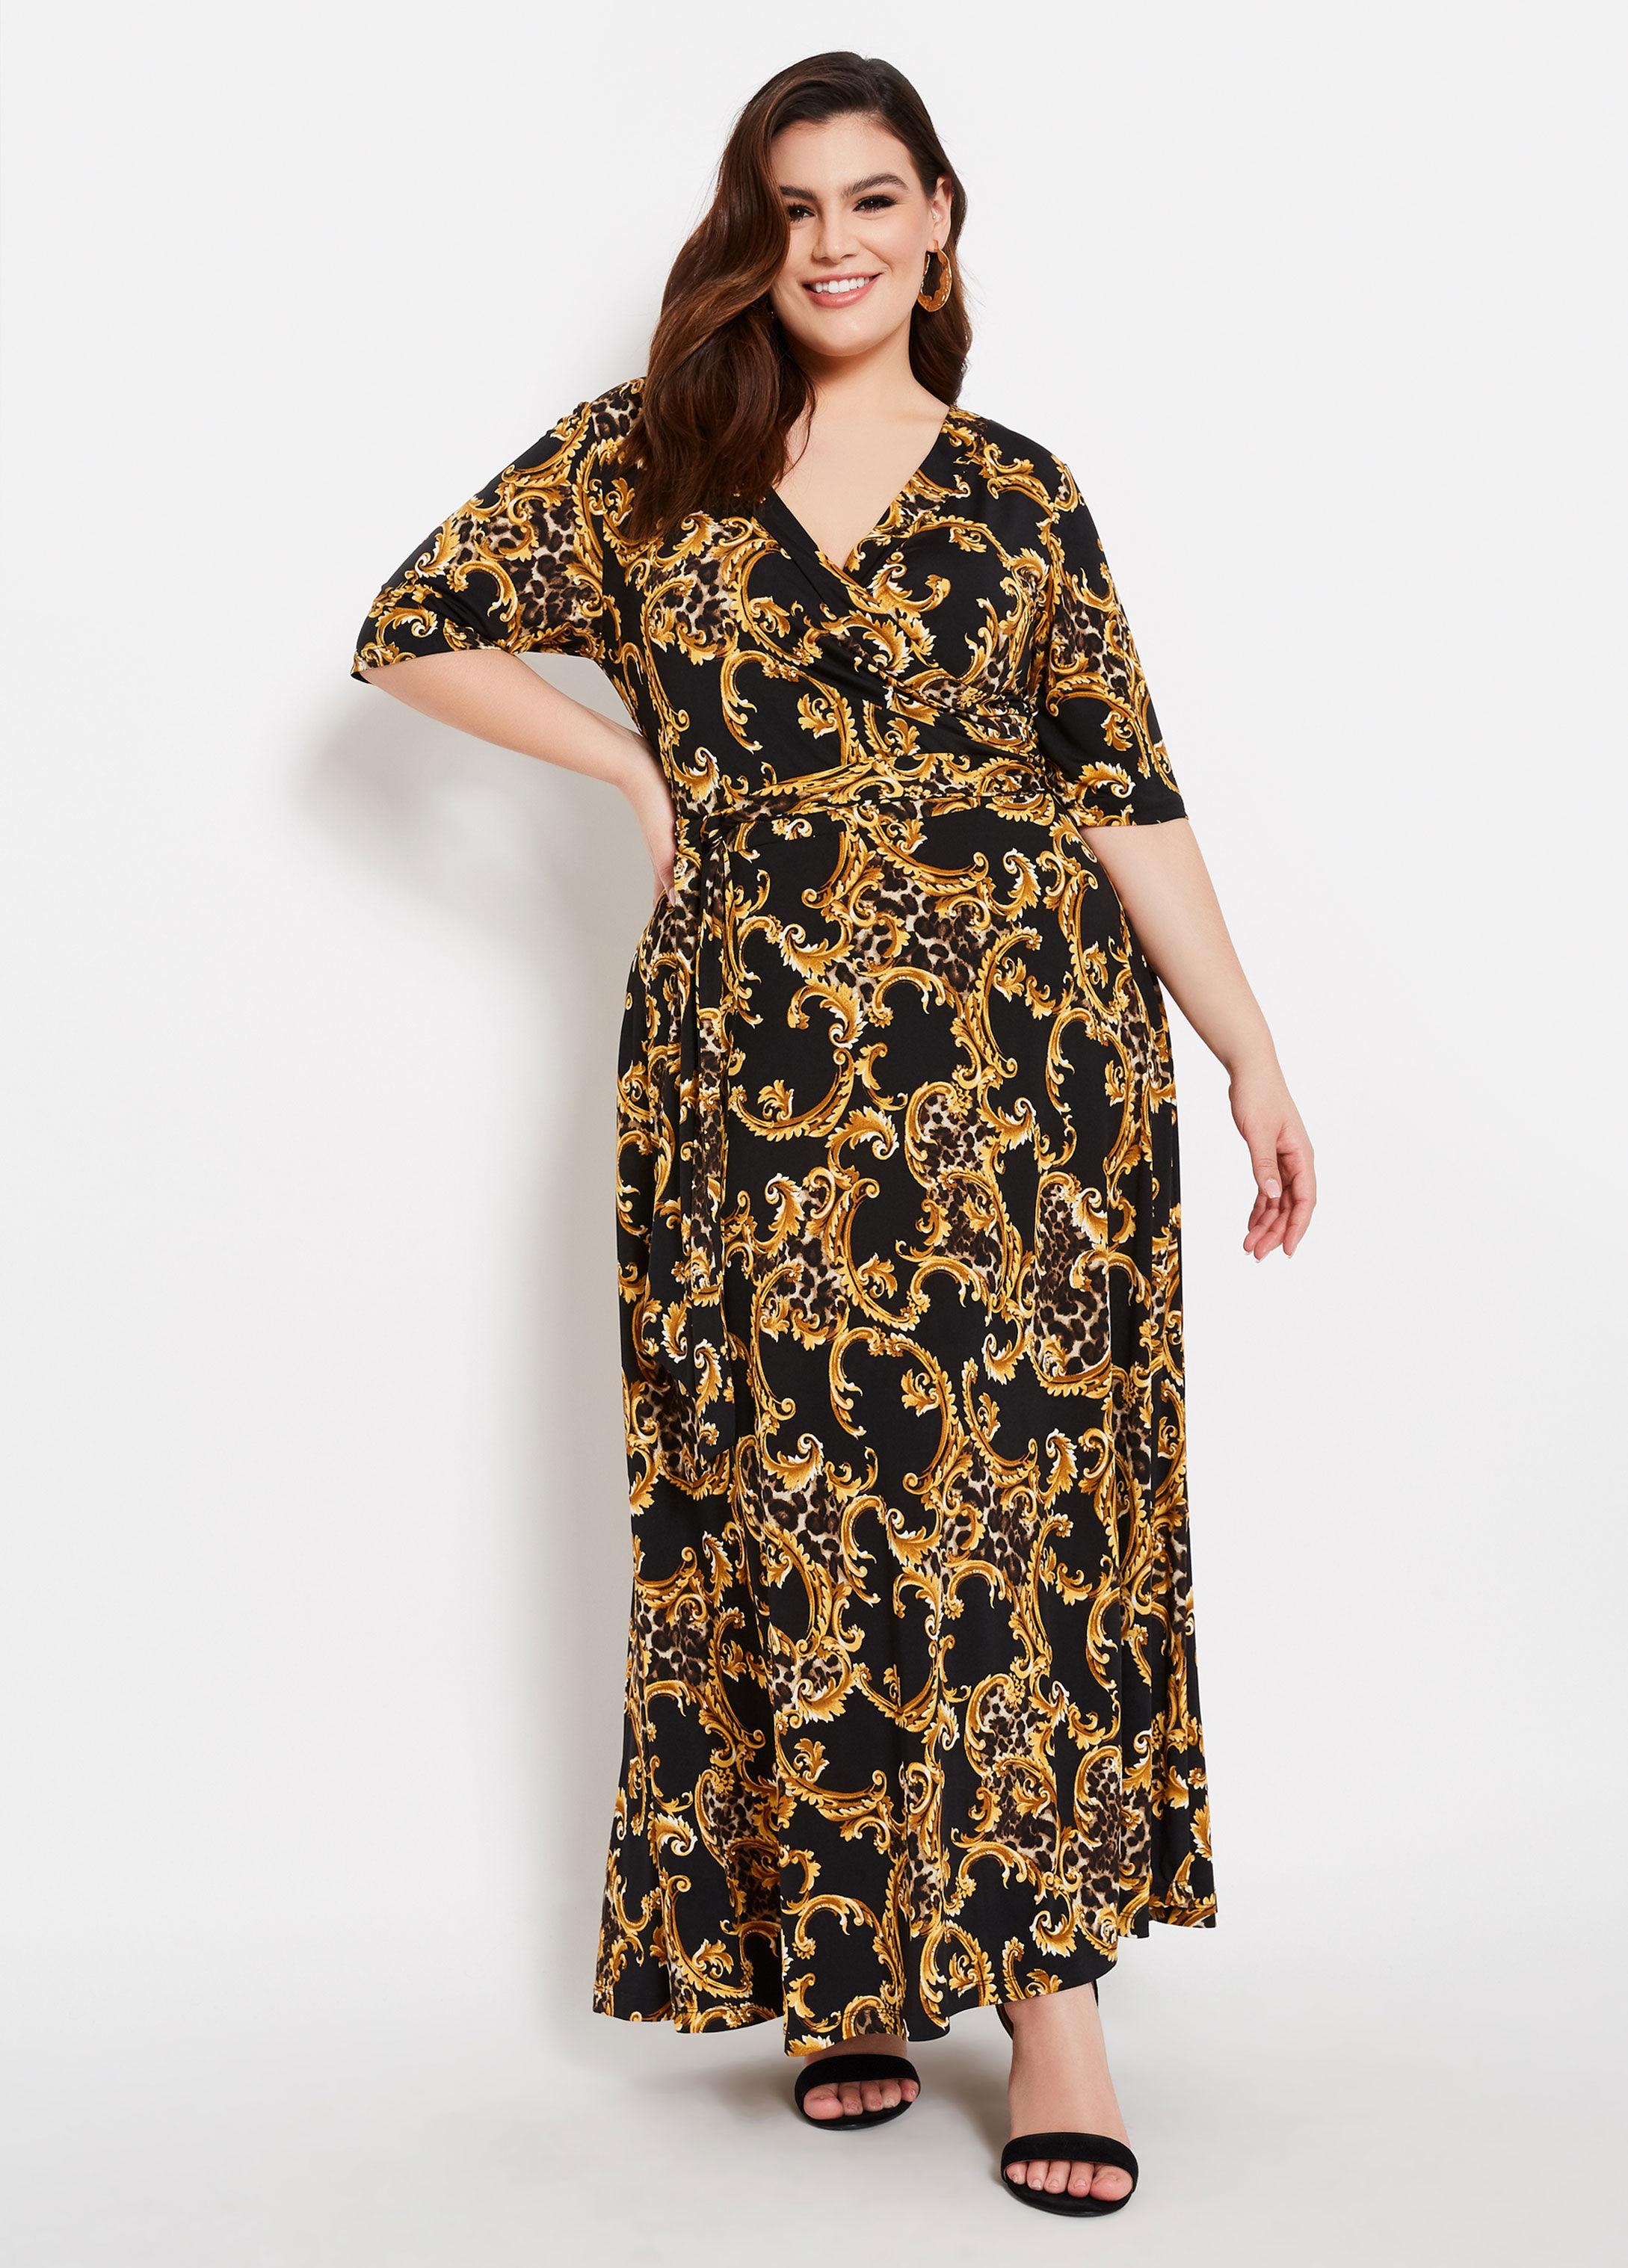 525ad7b136b0 Lyst - Ashley Stewart Plus Size Status Animal Print Faux Wrap Dress ...